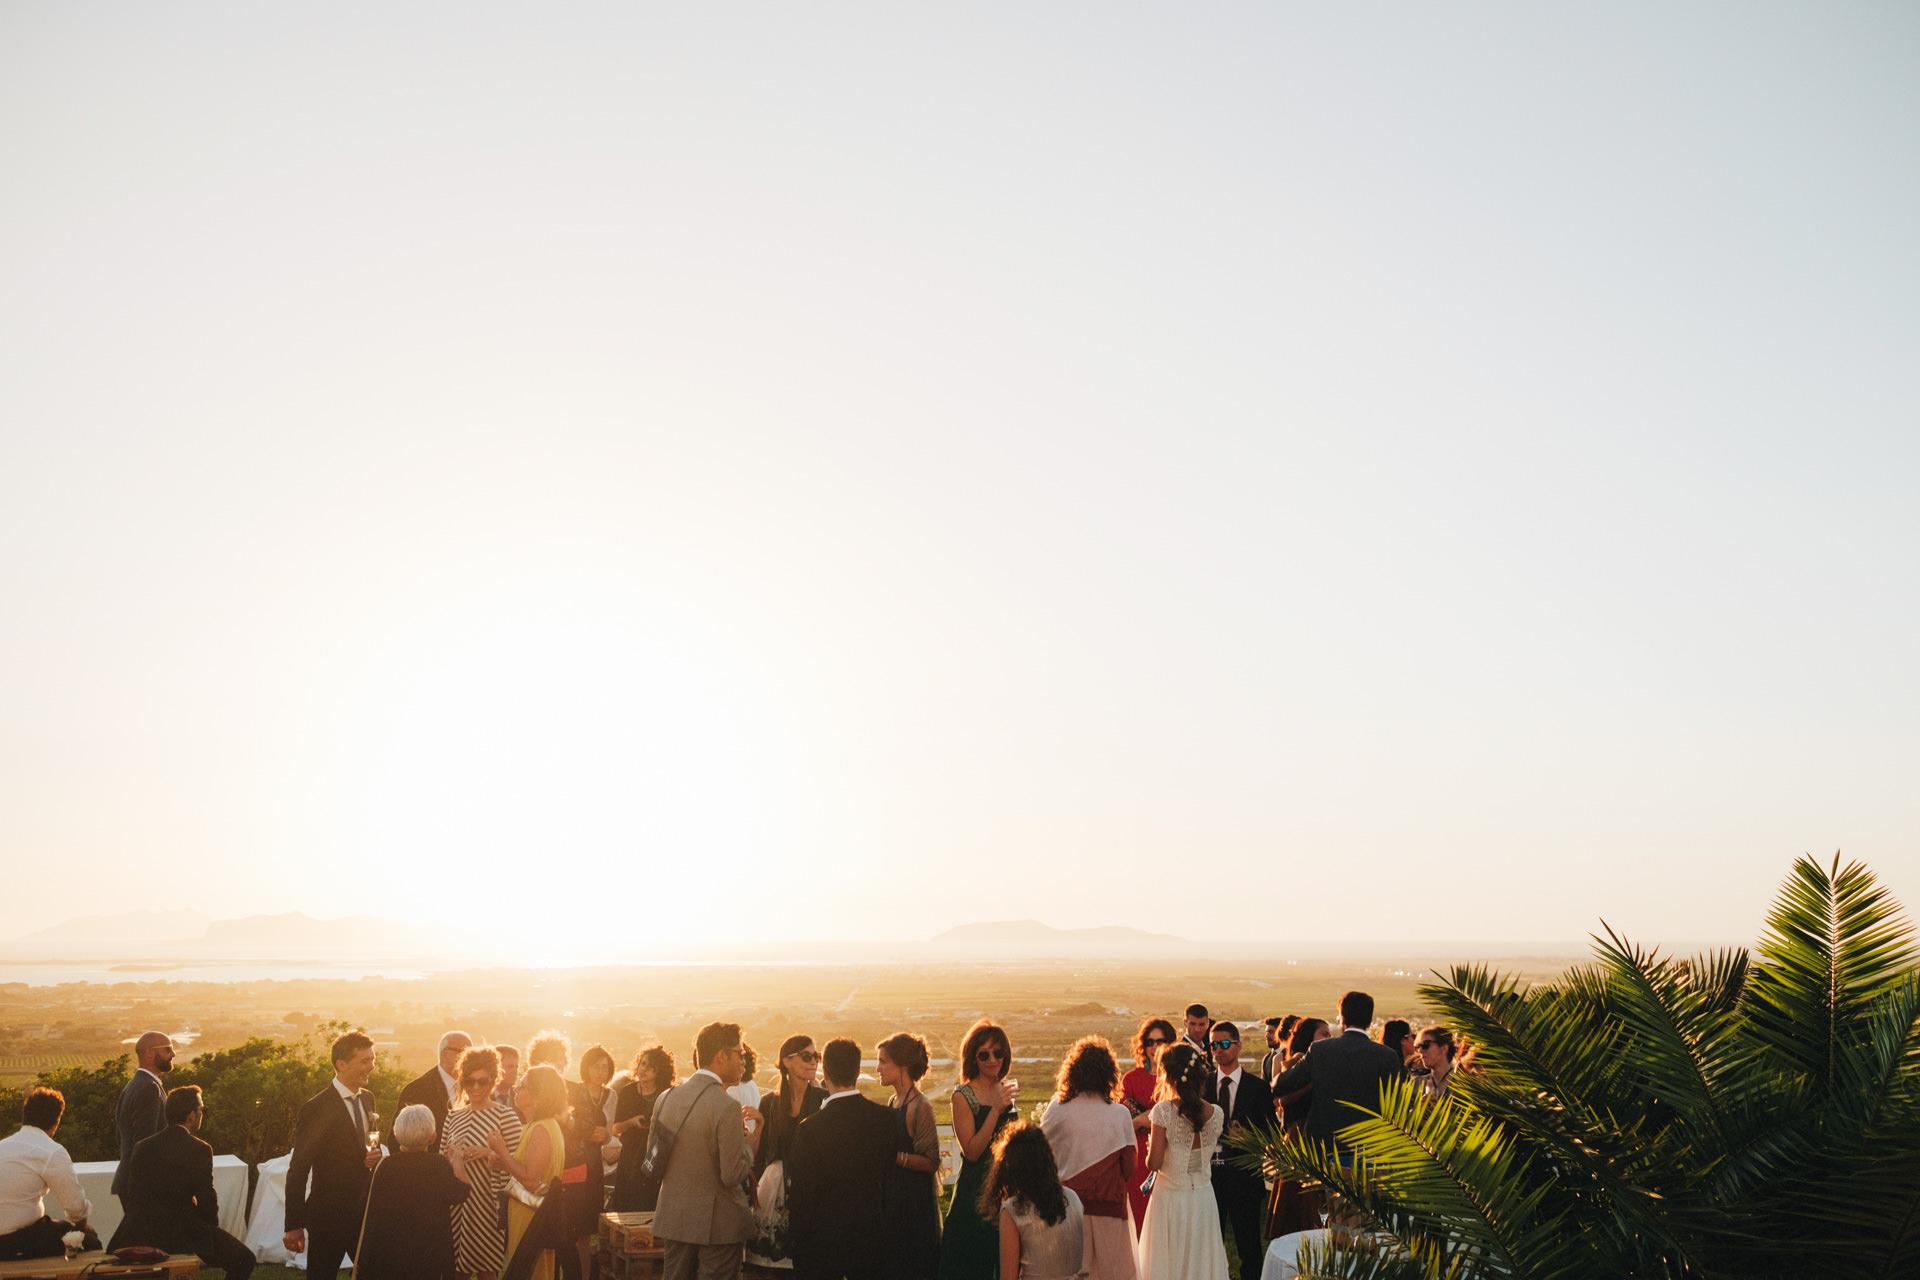 fotografi di matrimonio-52.jpg